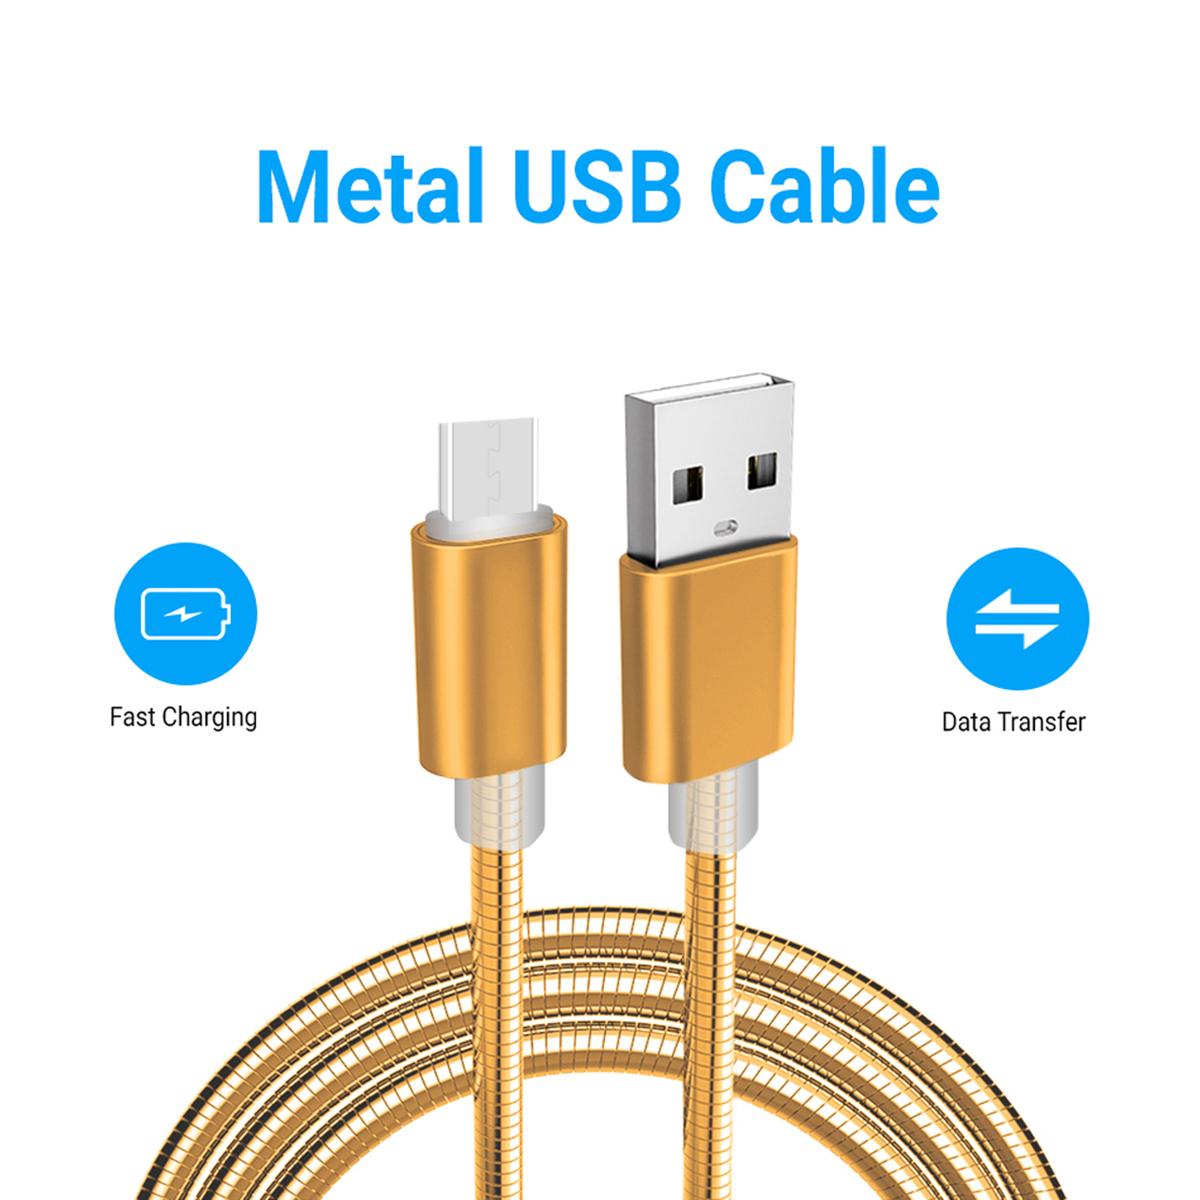 MCRO-USB-MTL-CBLE-GLD-2